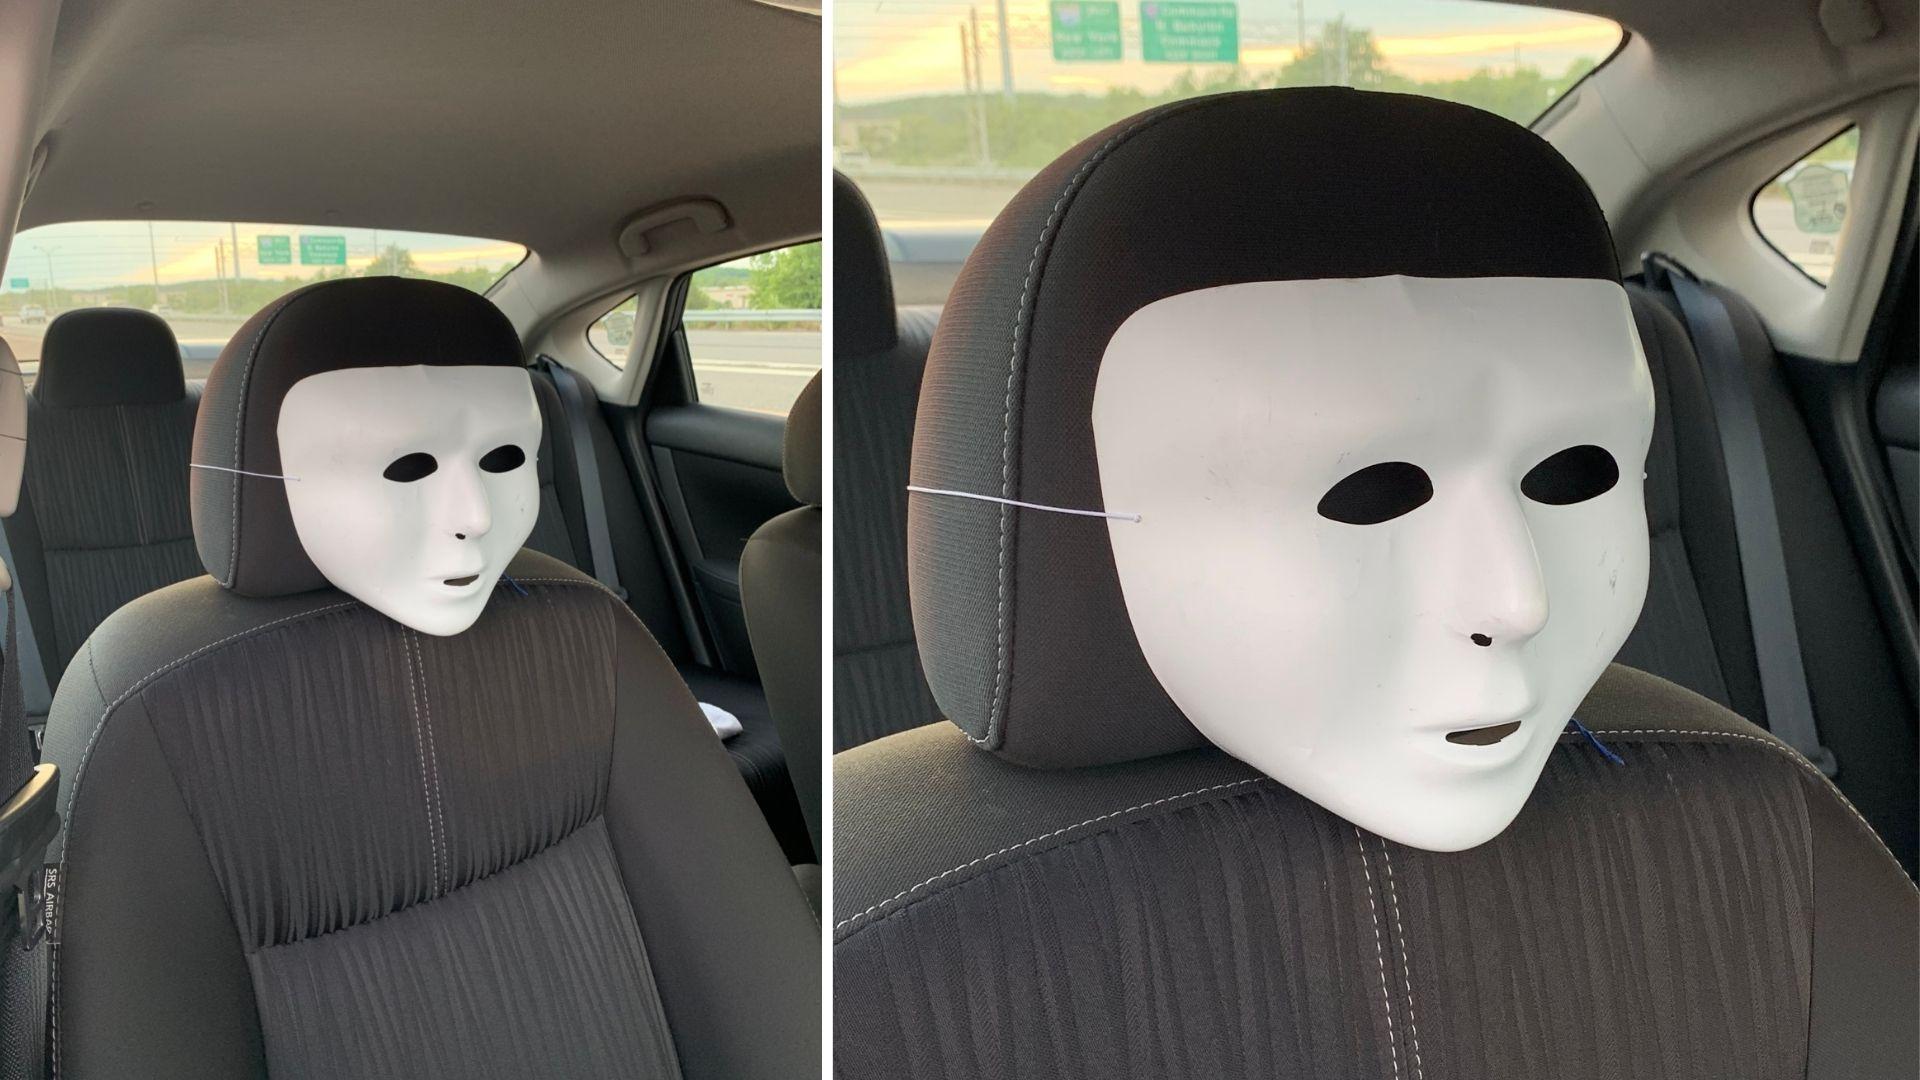 Man puts mask on headrest to use HOV lane on Long Island Expressway